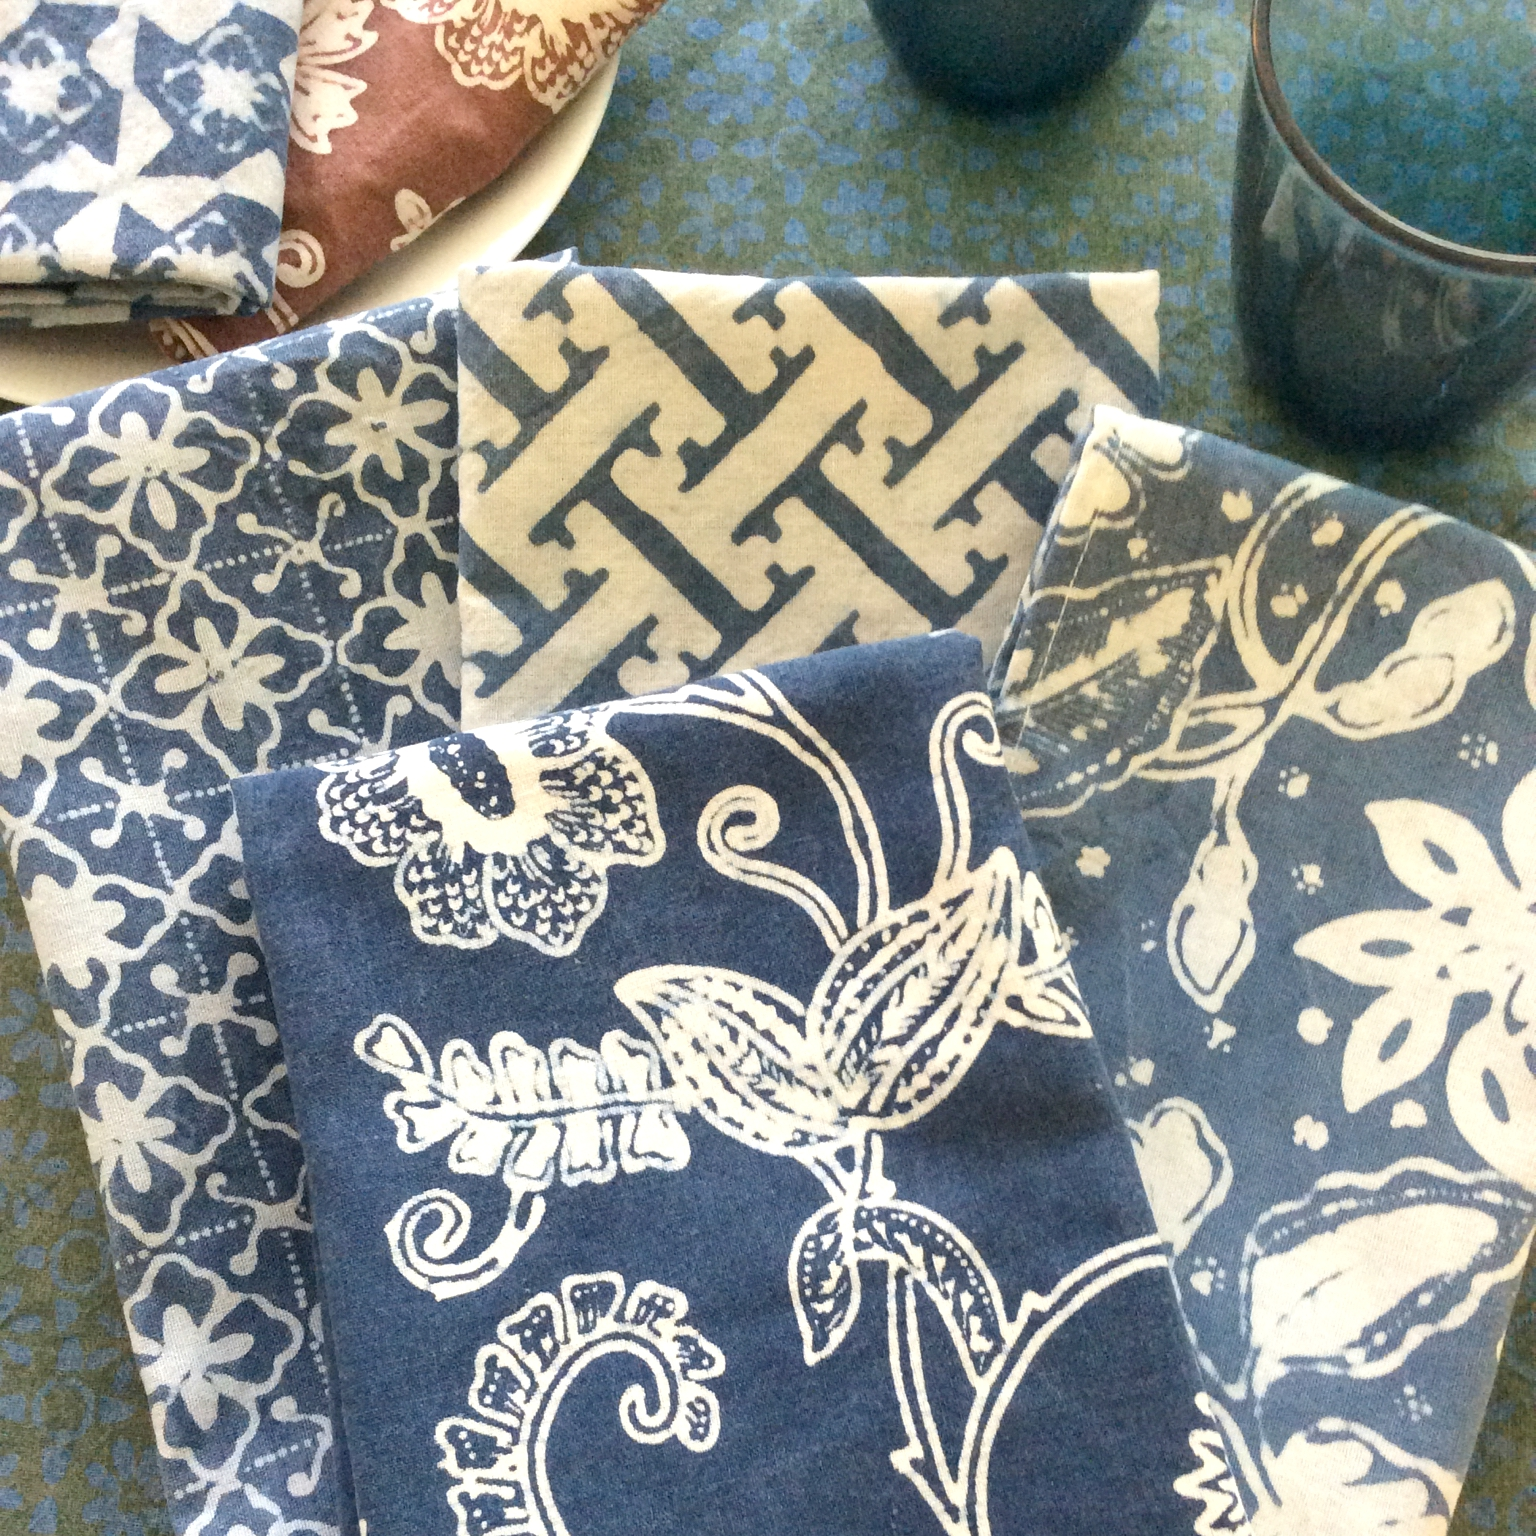 Mixed indigo napkins